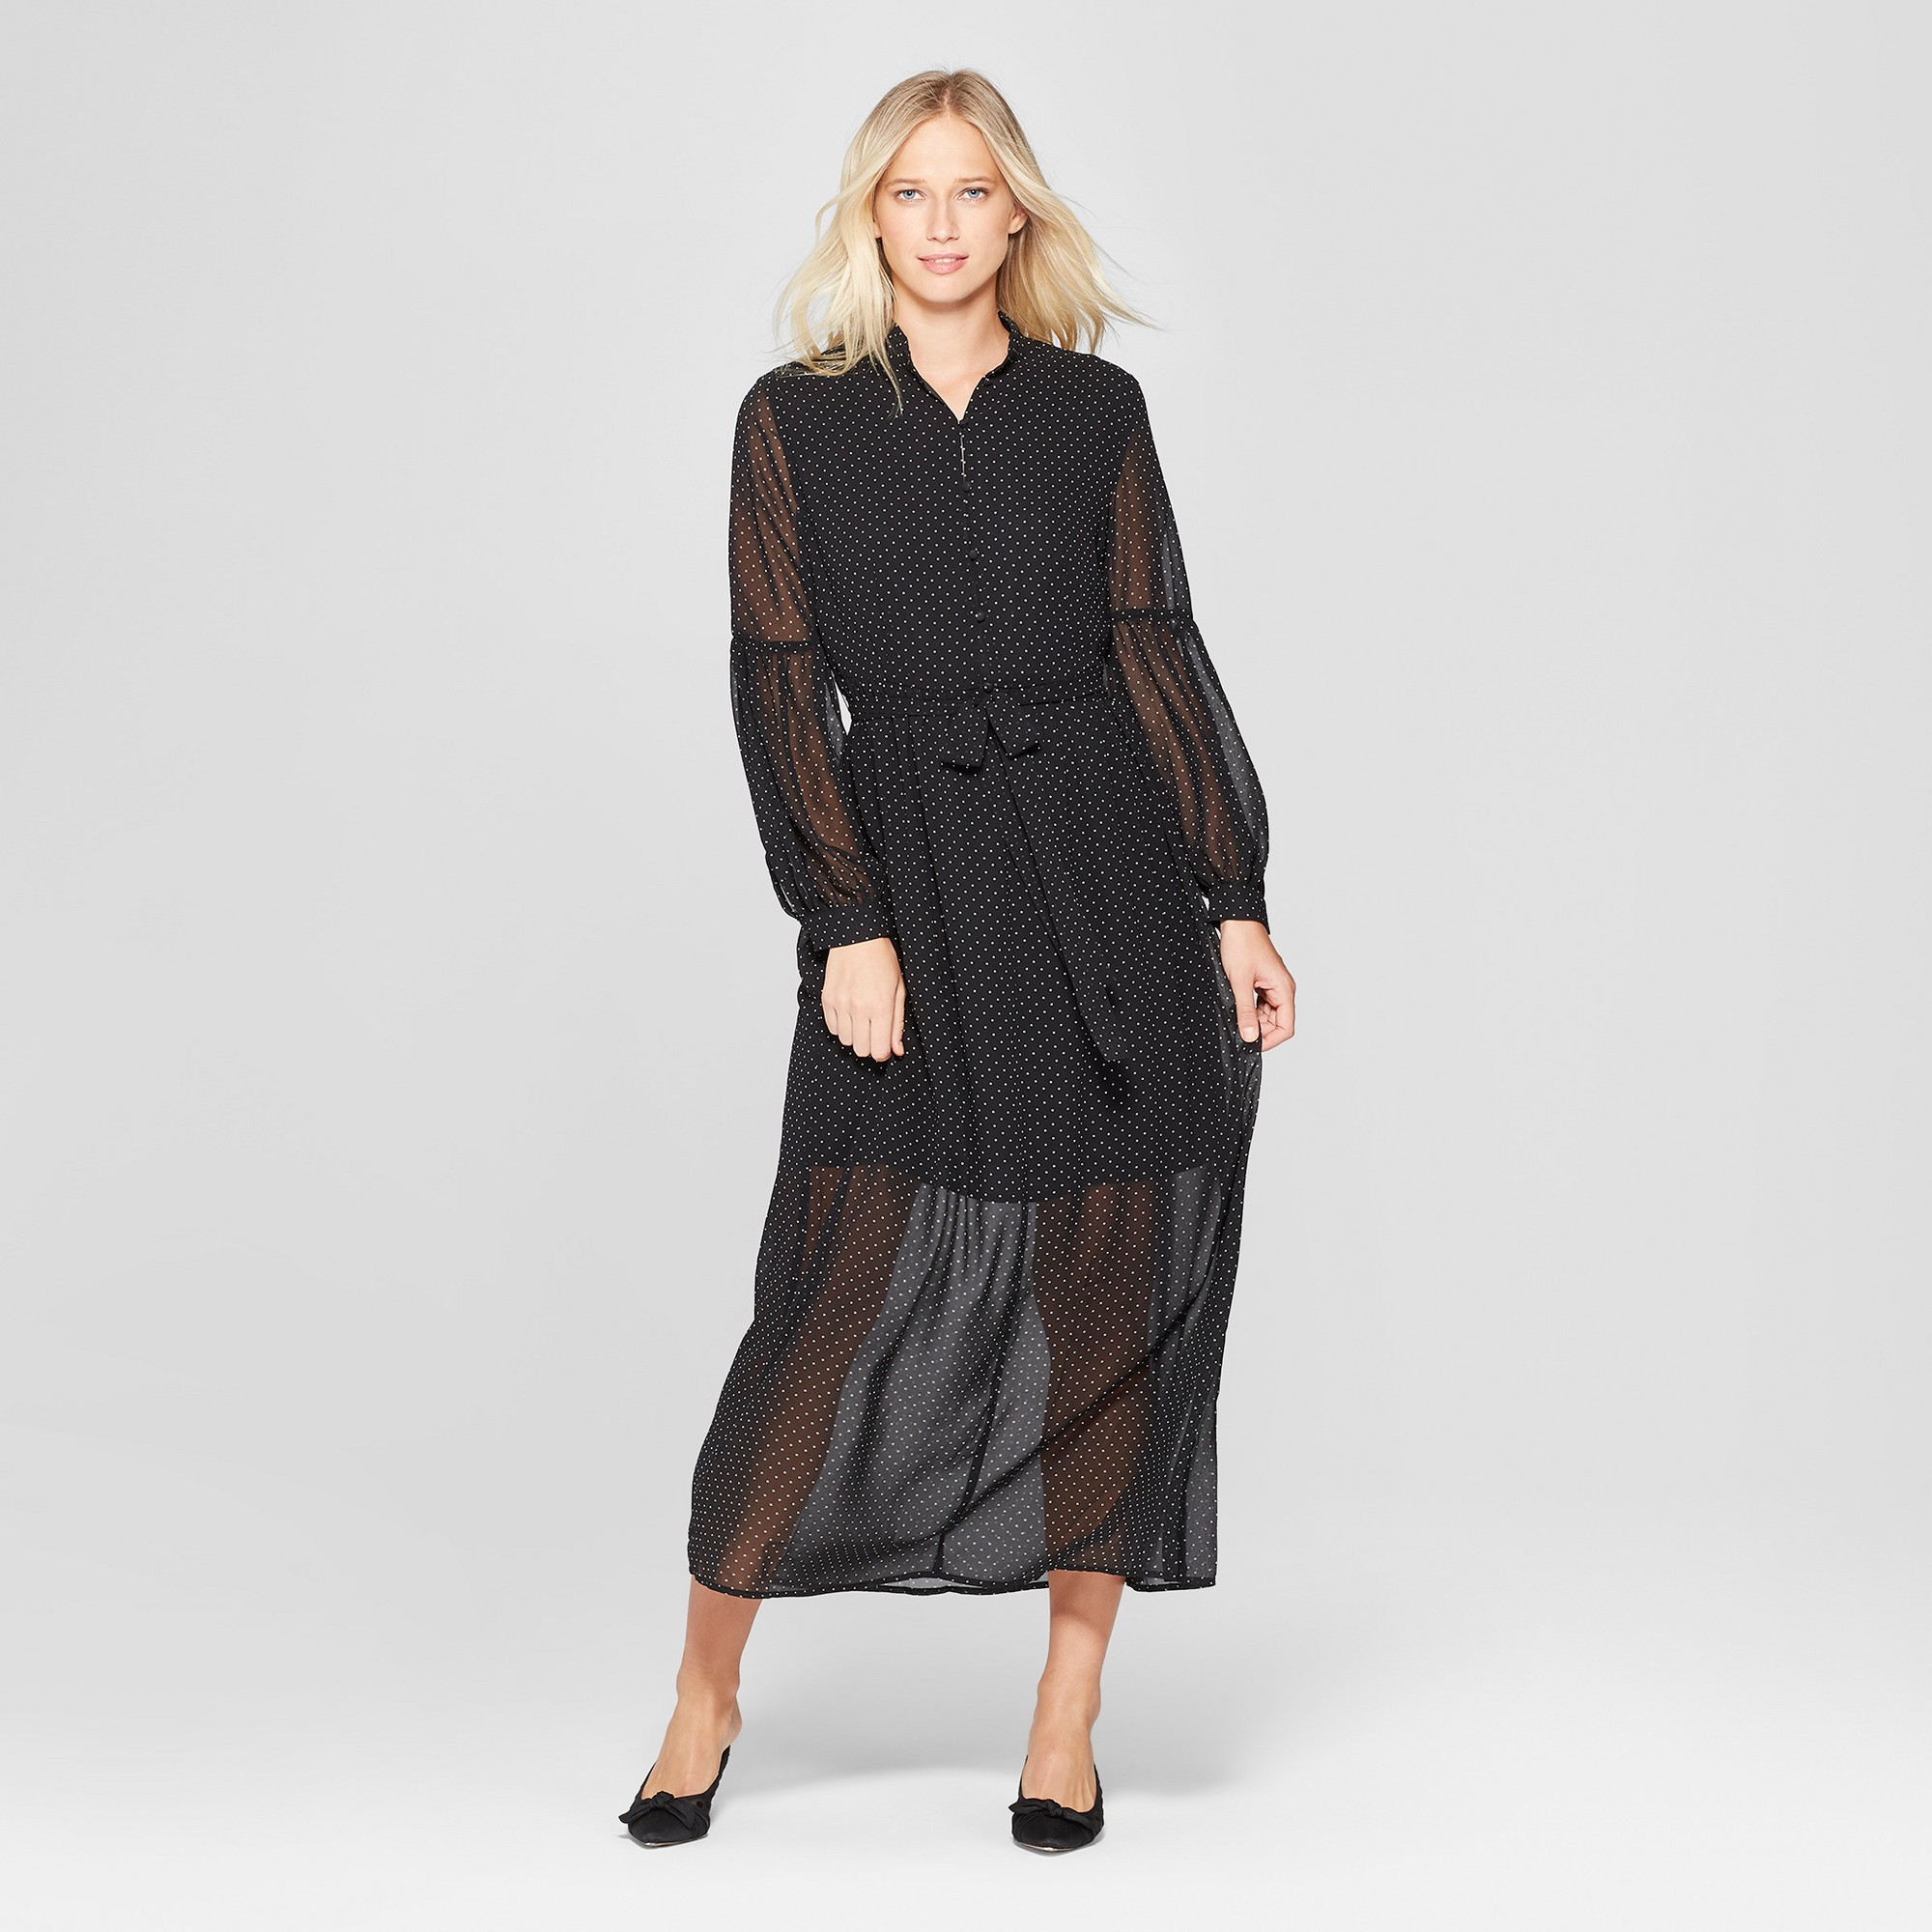 725419d13be Women s Polka Dot Long Sleeve Belted Maxi Dress - Who What Wear Black White  Xxl